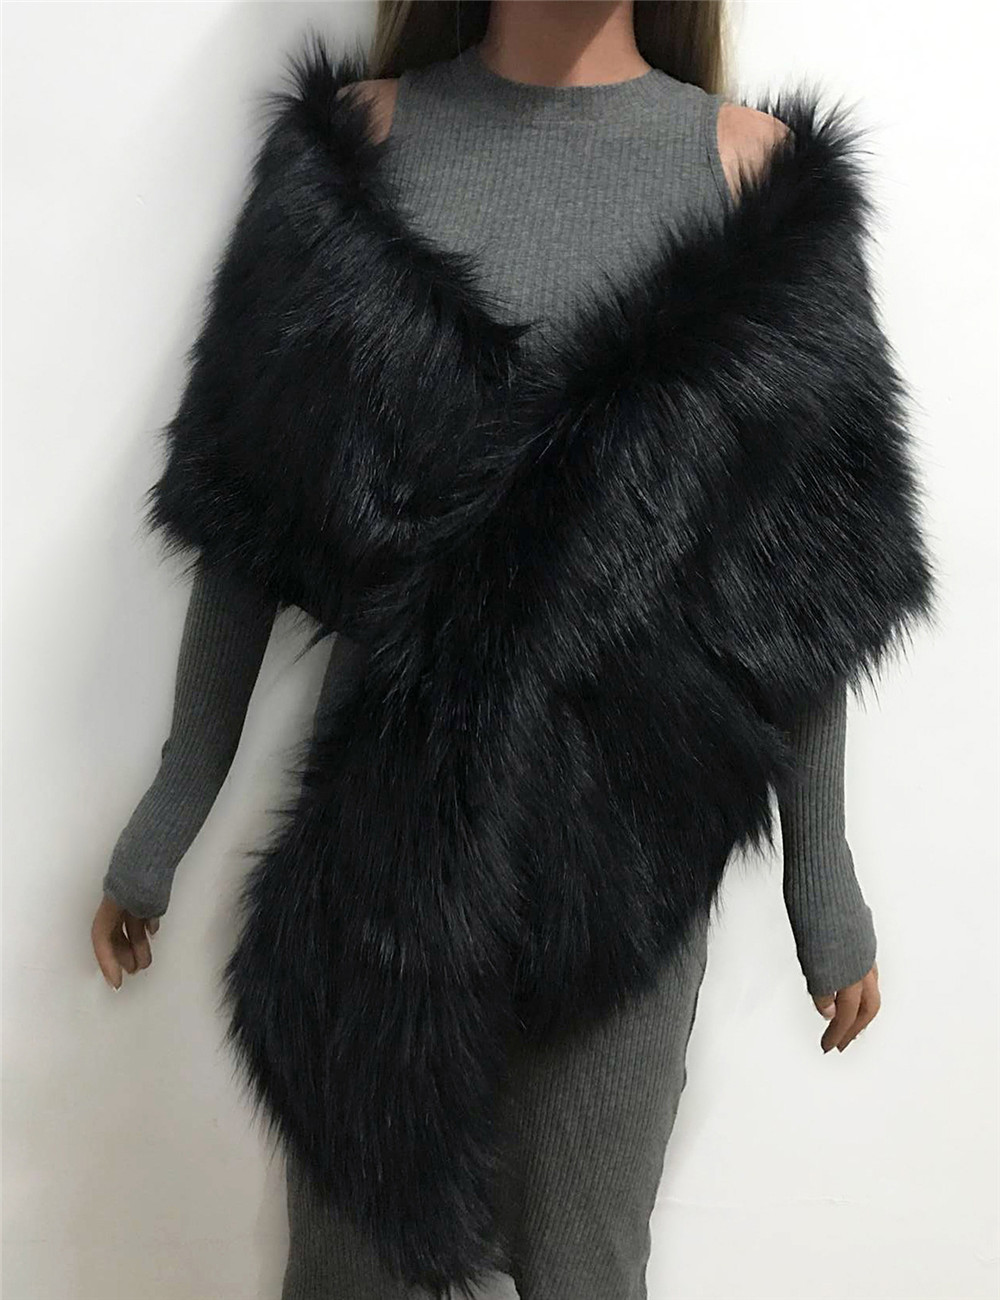 The autumn and winter new imitation fur big cape neck scarf multi-color joker scarf bride dress cross cape (8)